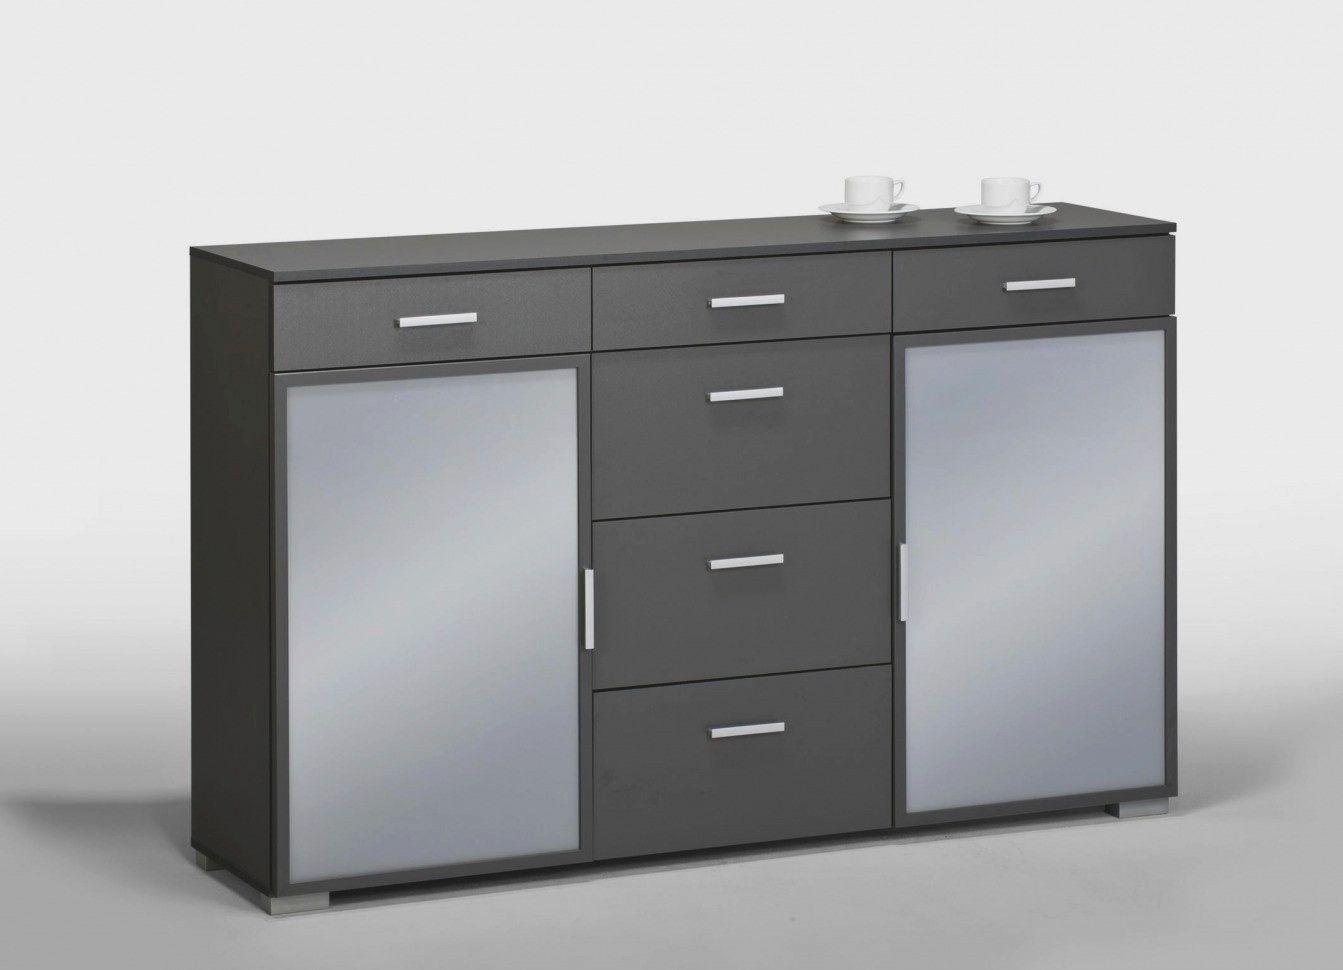 Meuble Bas But Gallery Locker Storage Furniture Filing Cabinet